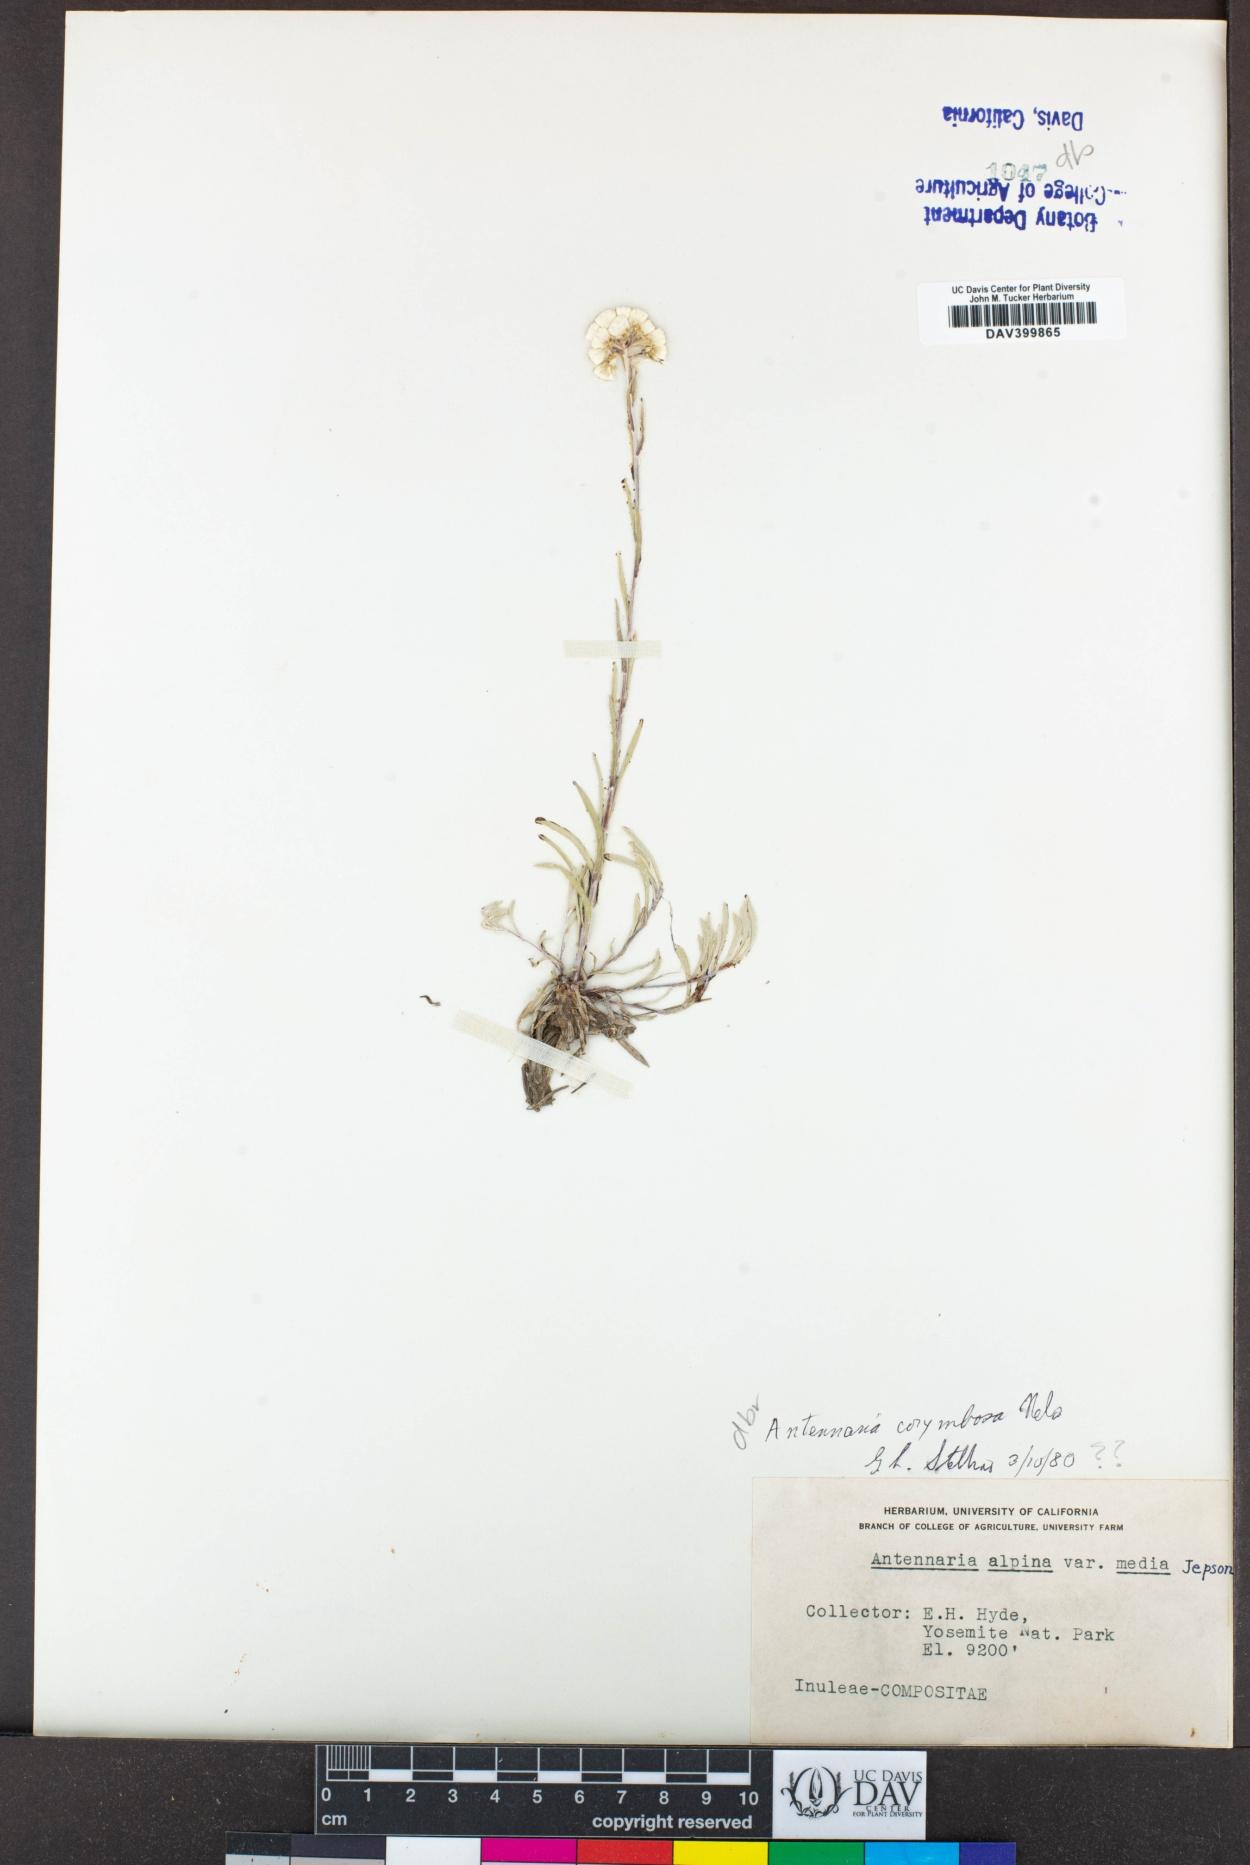 Antennaria corymbosa image